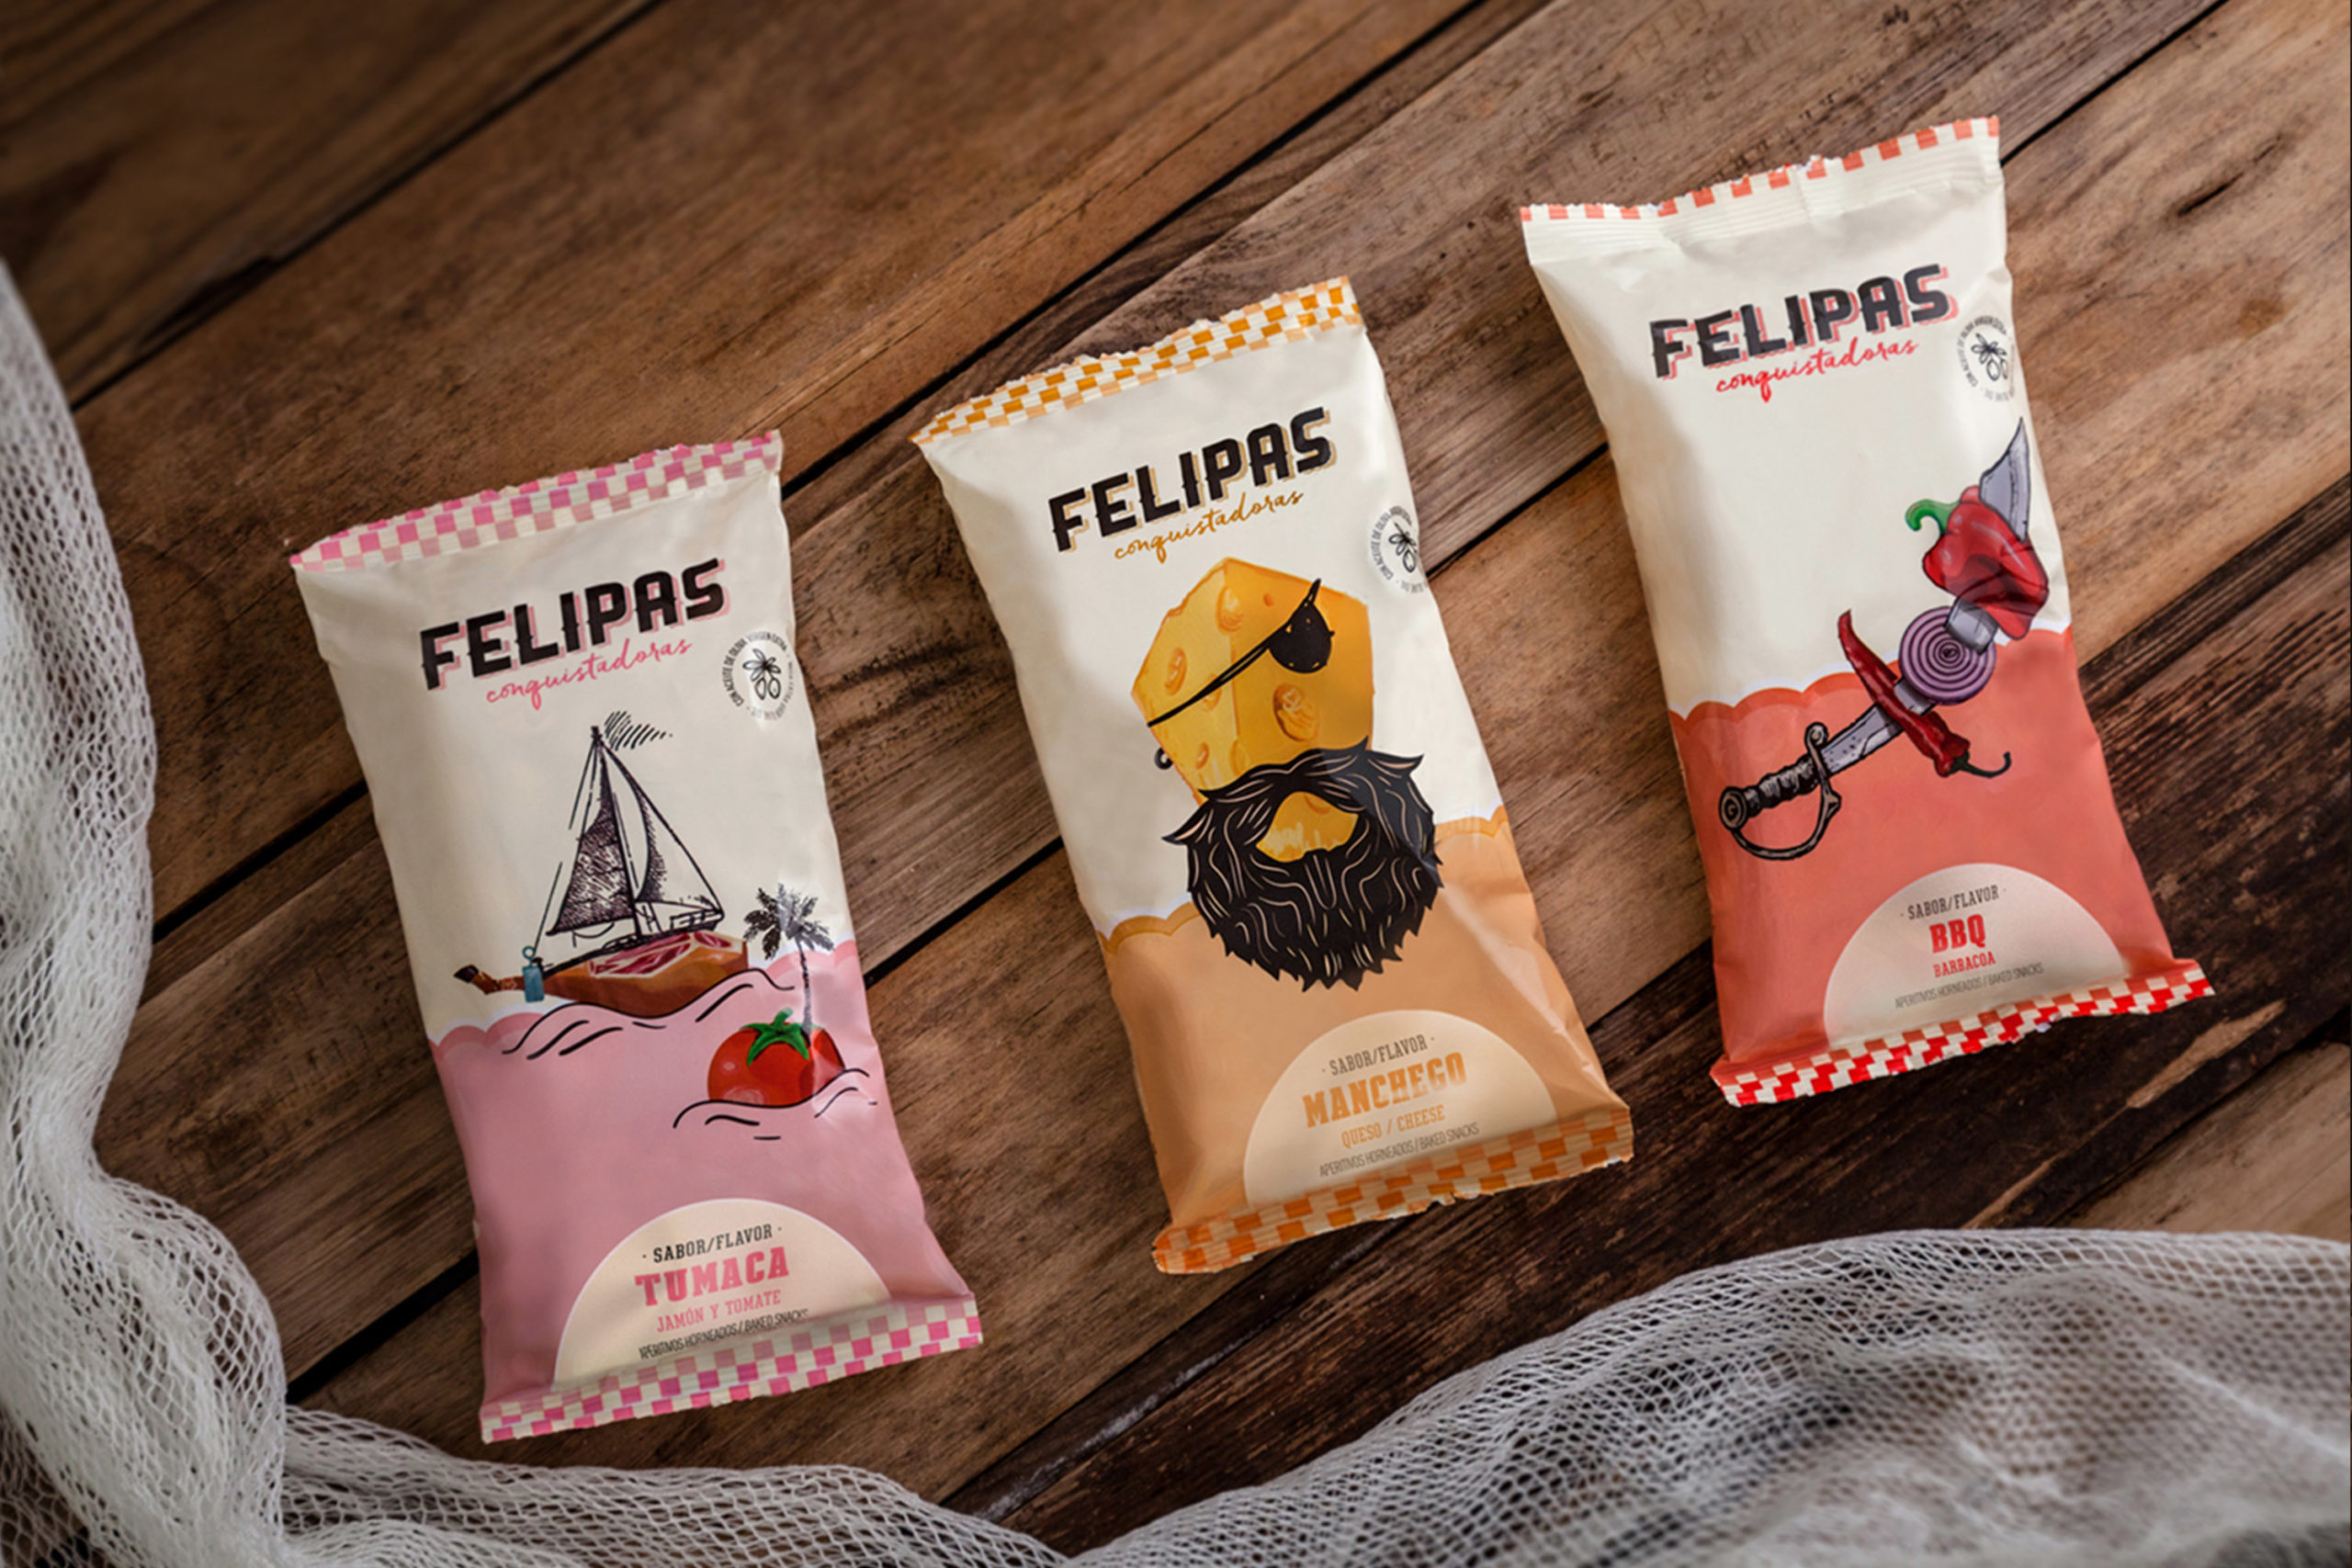 Felipas Conquistadoras Snack